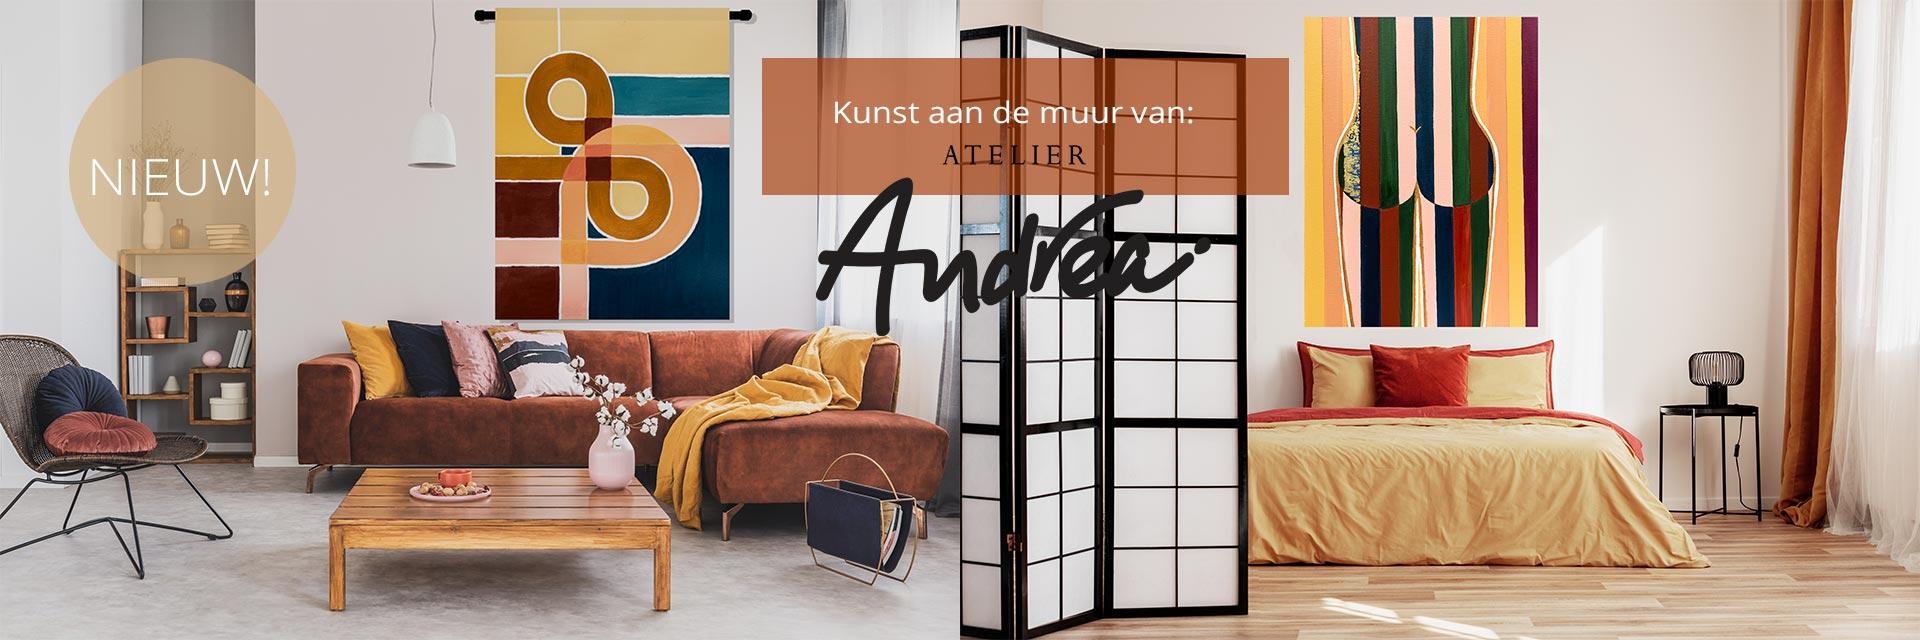 Atelier-Andrea-wanddecoratie